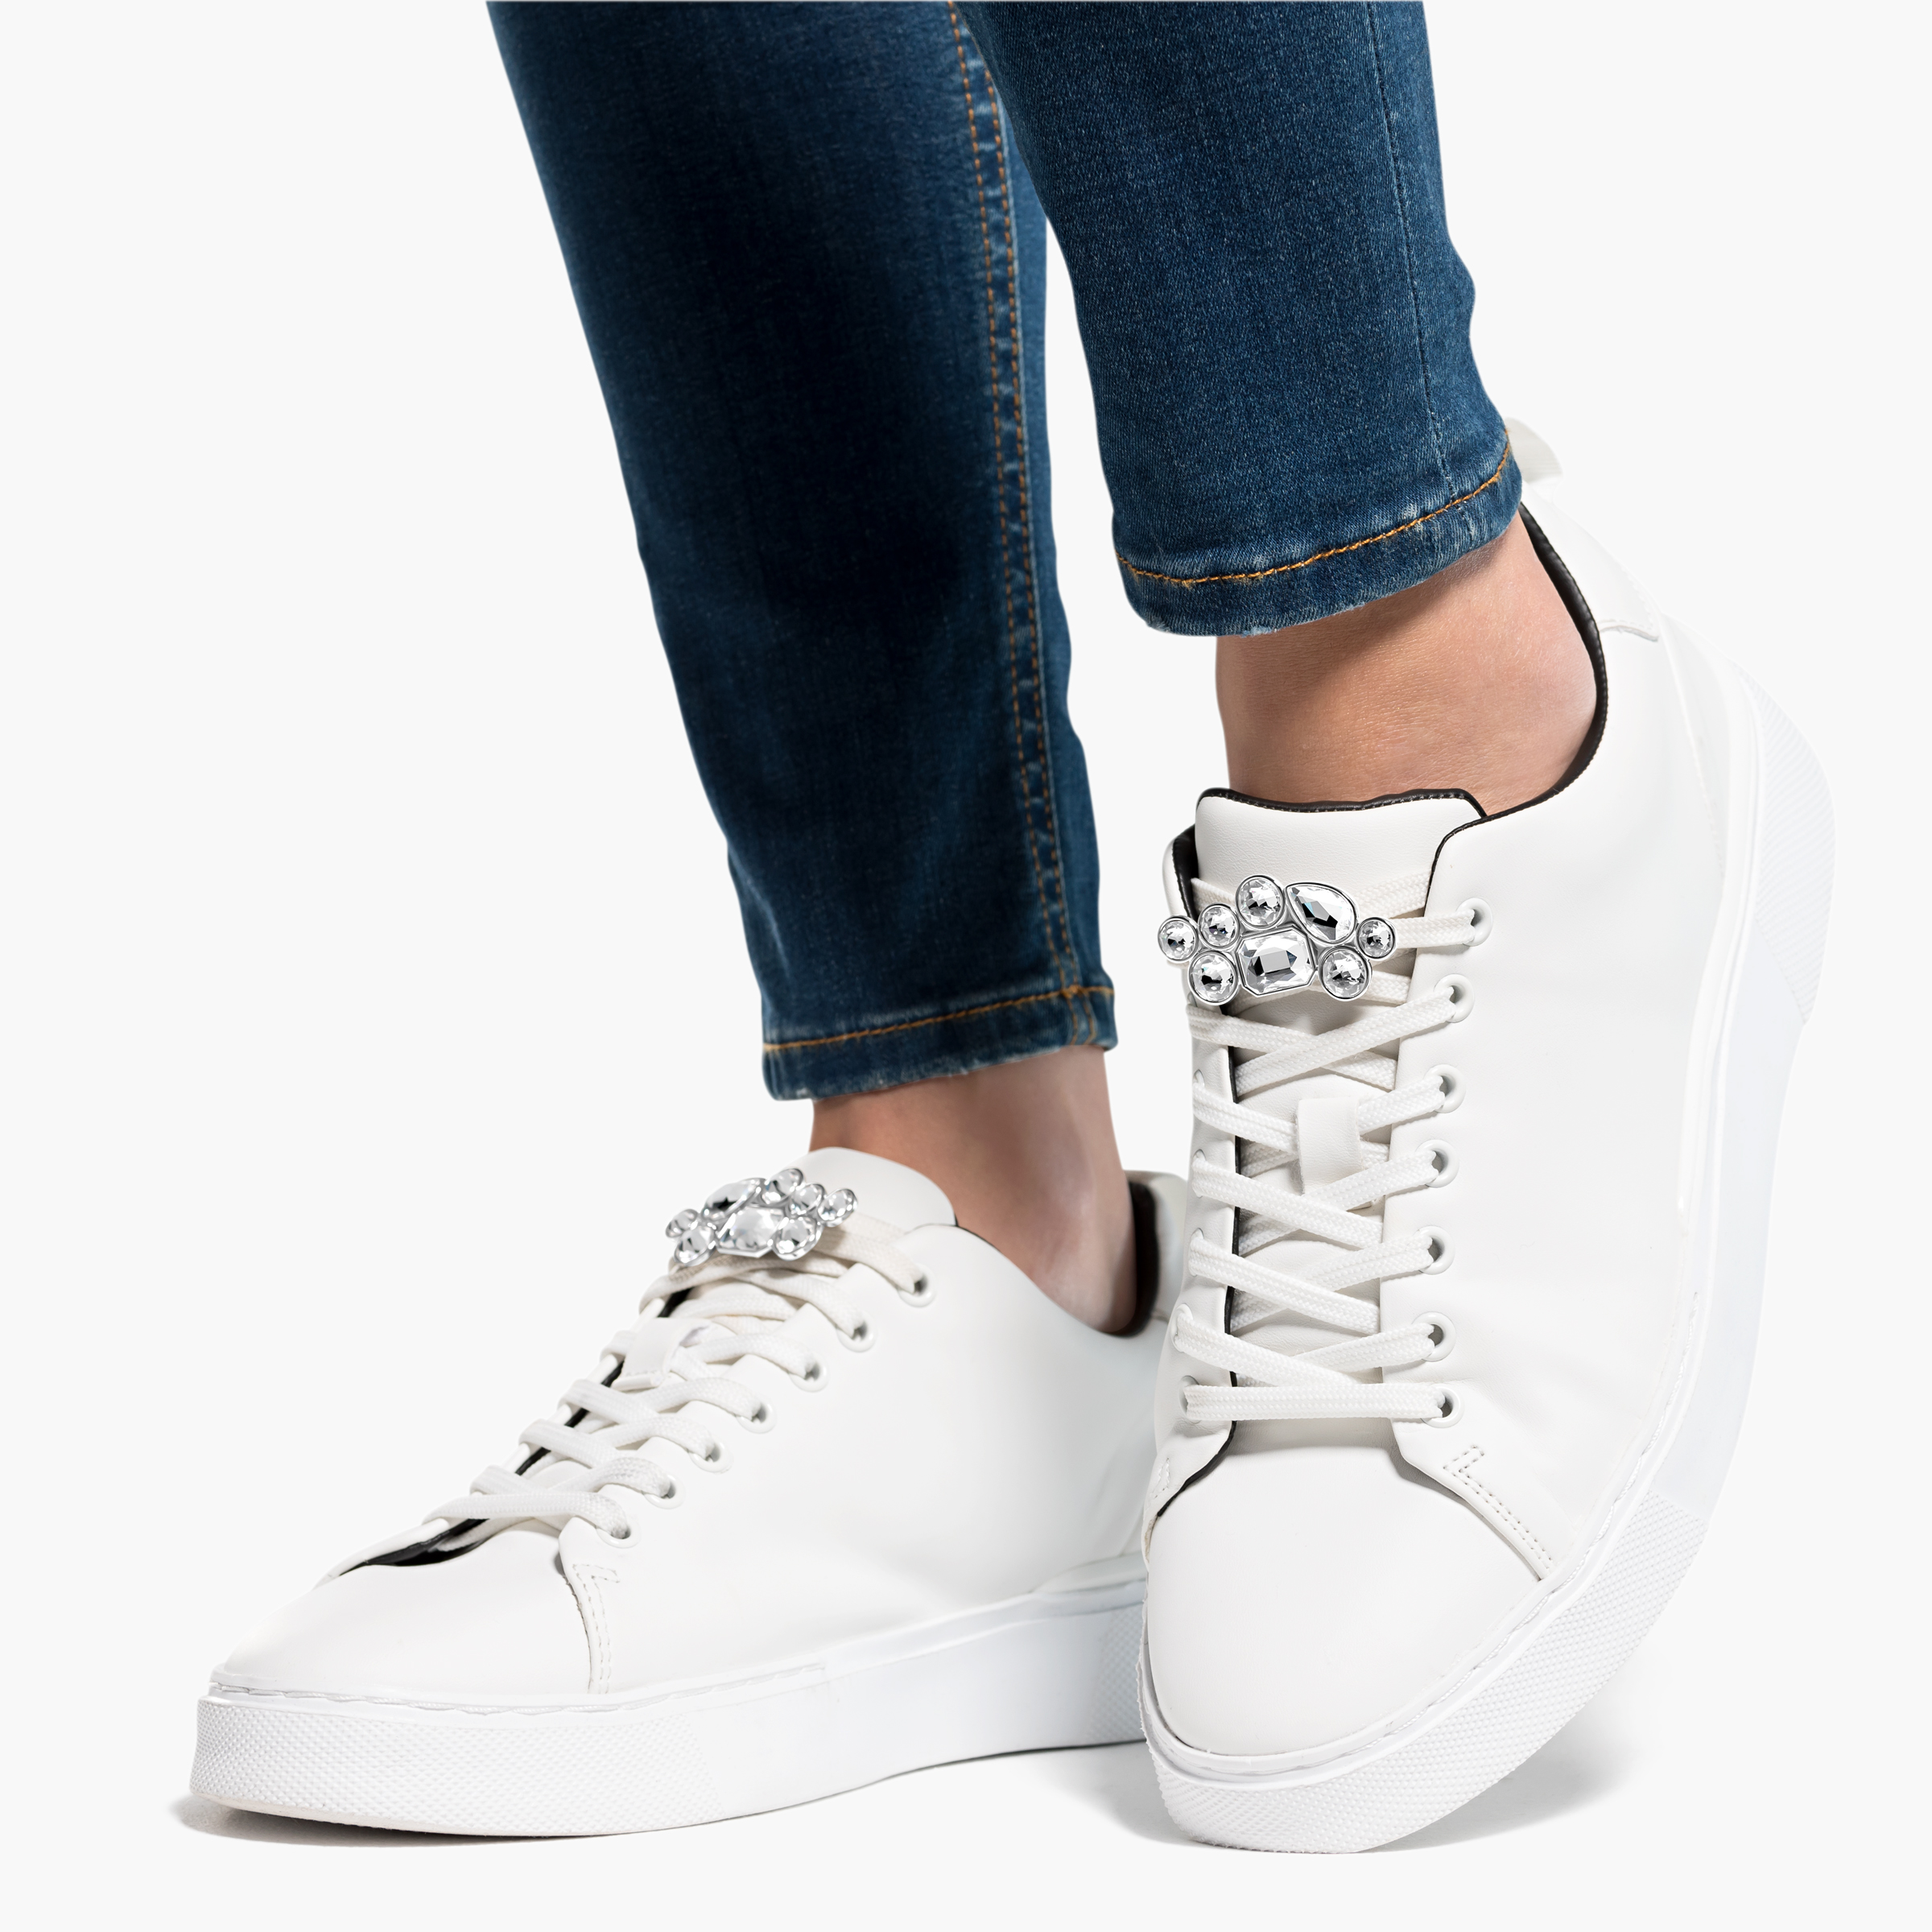 Clips à chaussure Swarovski, blanc, métal rhodié, Swarovski